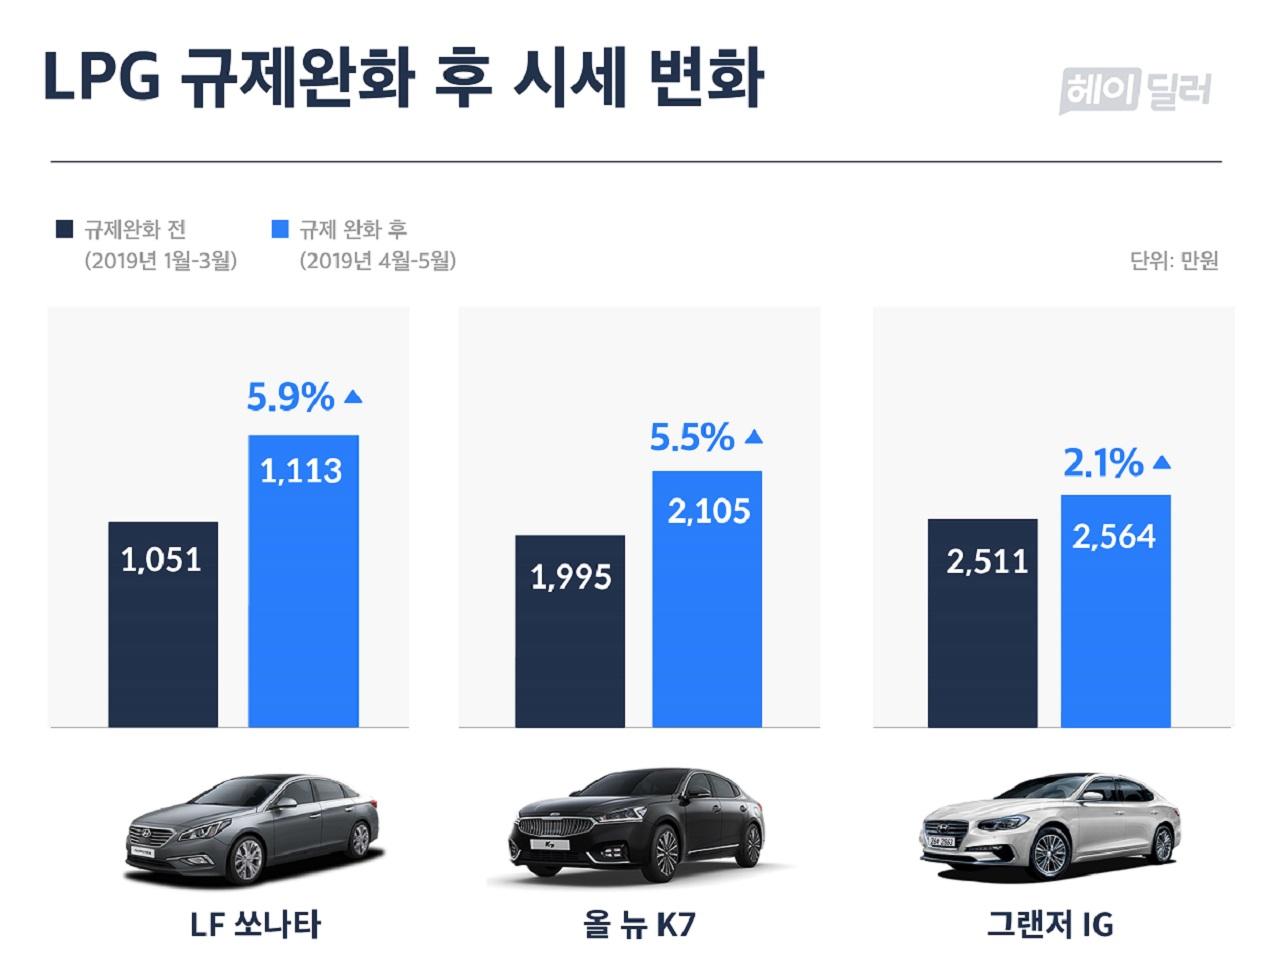 [Graph] LPG Price